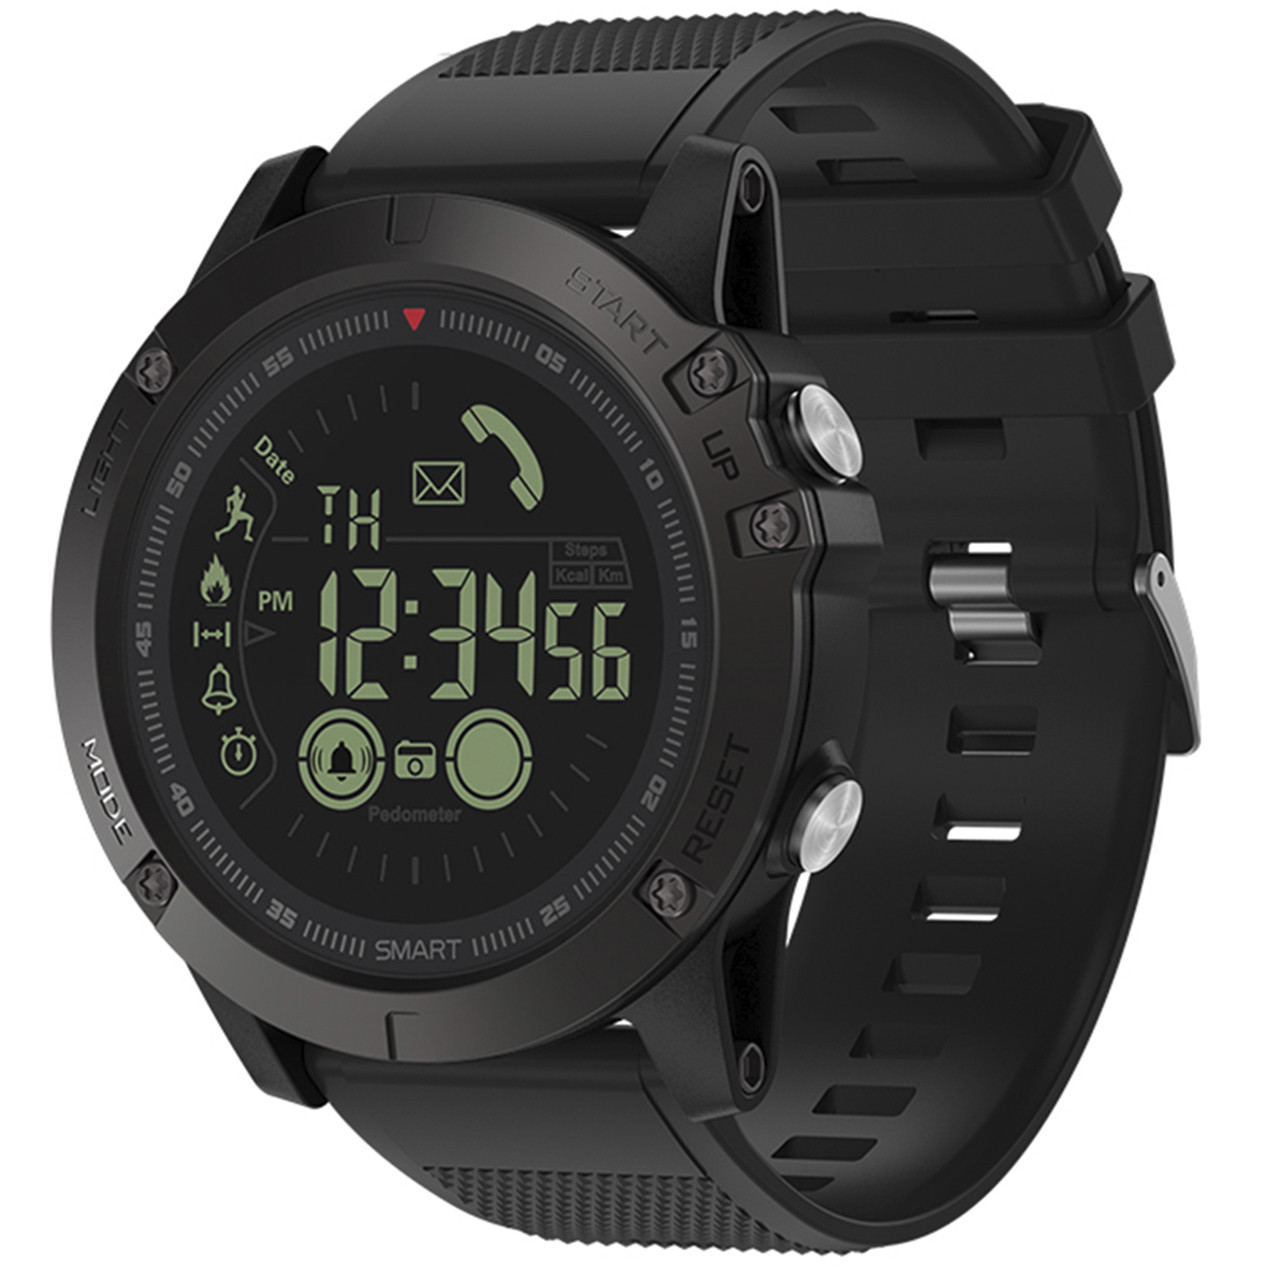 "✦Смарт-часы Zeblaze VIBE 3 Black OLED 1.24"" стальной корпус Bluetooth 4.0 батарея 610мАч Android 4.3 IP67"